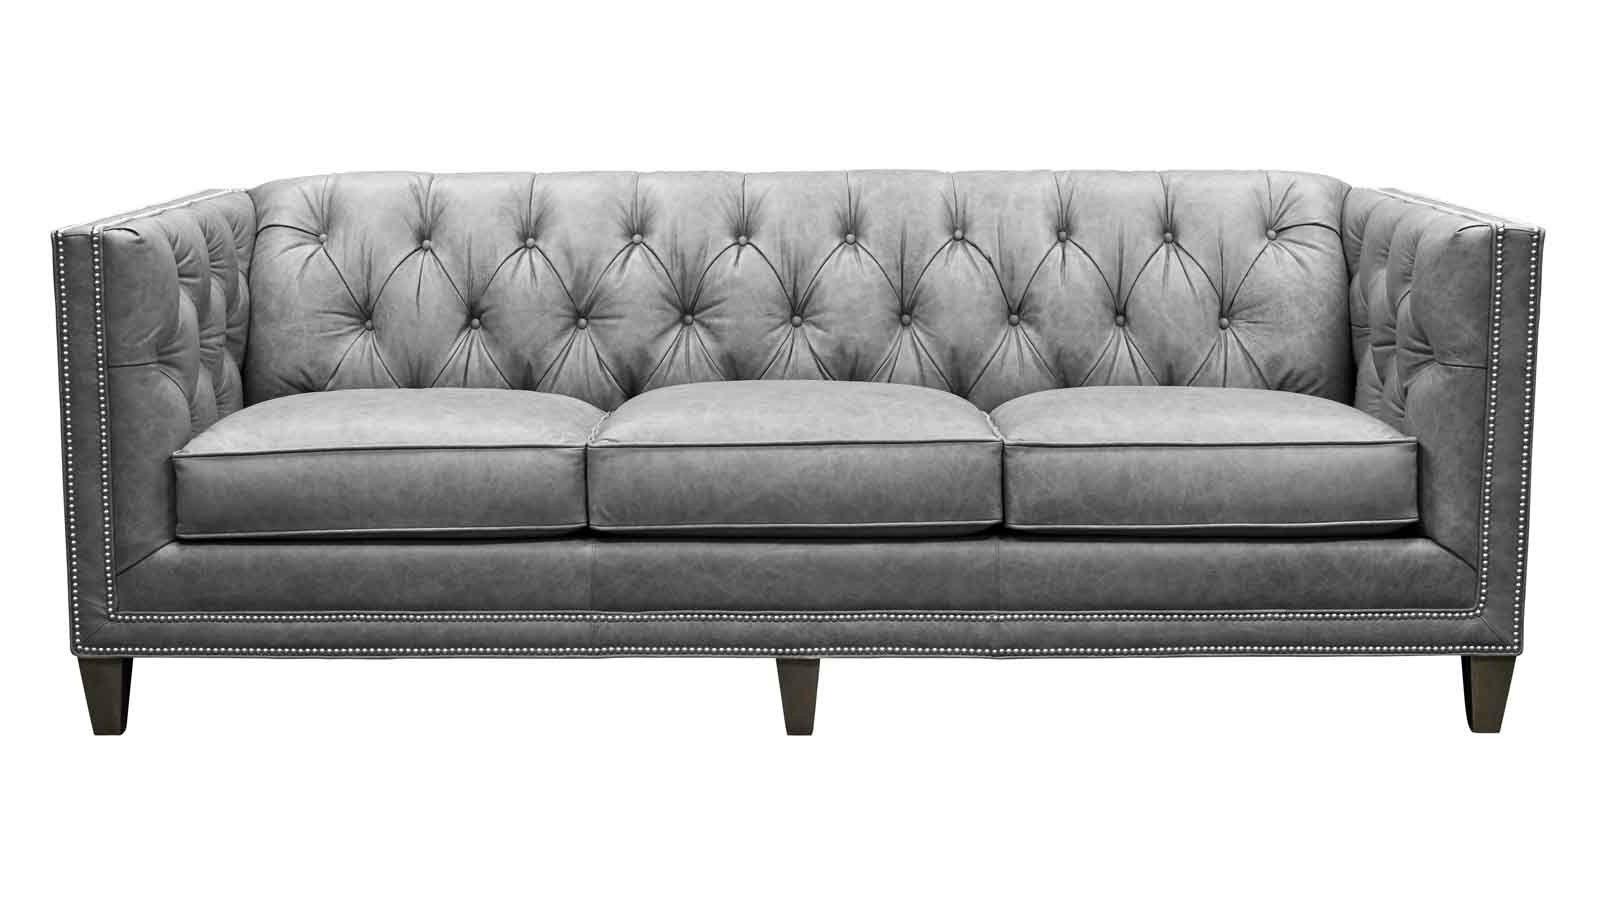 Favorite Taren Reversible Sofa/chaise Sleeper Sectionals With Storage Ottoman Within Elegant Macys Sofa Sleeper Concept – Modern Sofa Design Ideas (View 4 of 20)